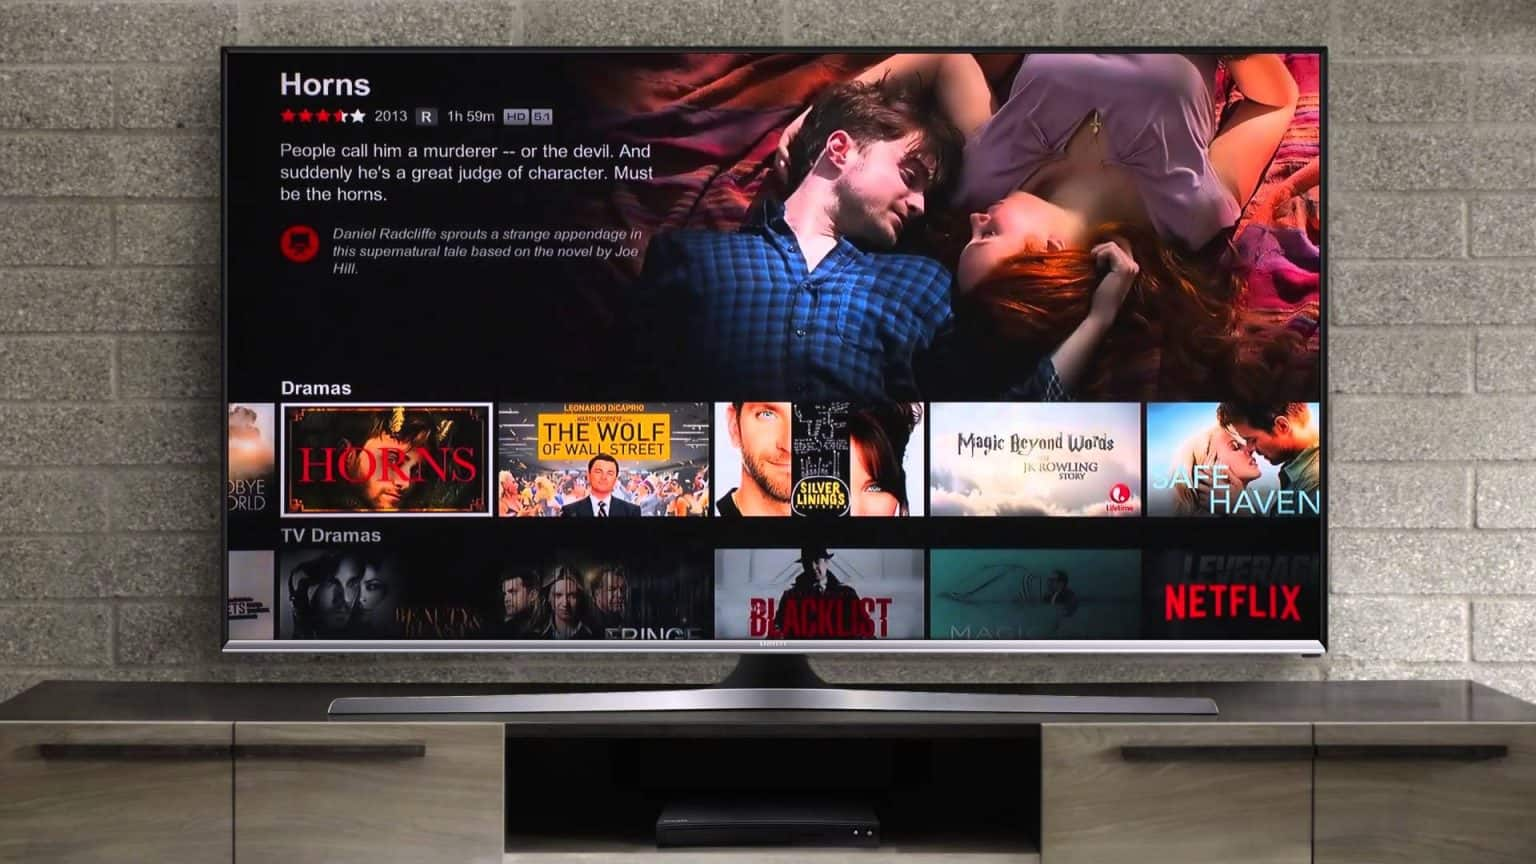 Netflix not working on smart TV